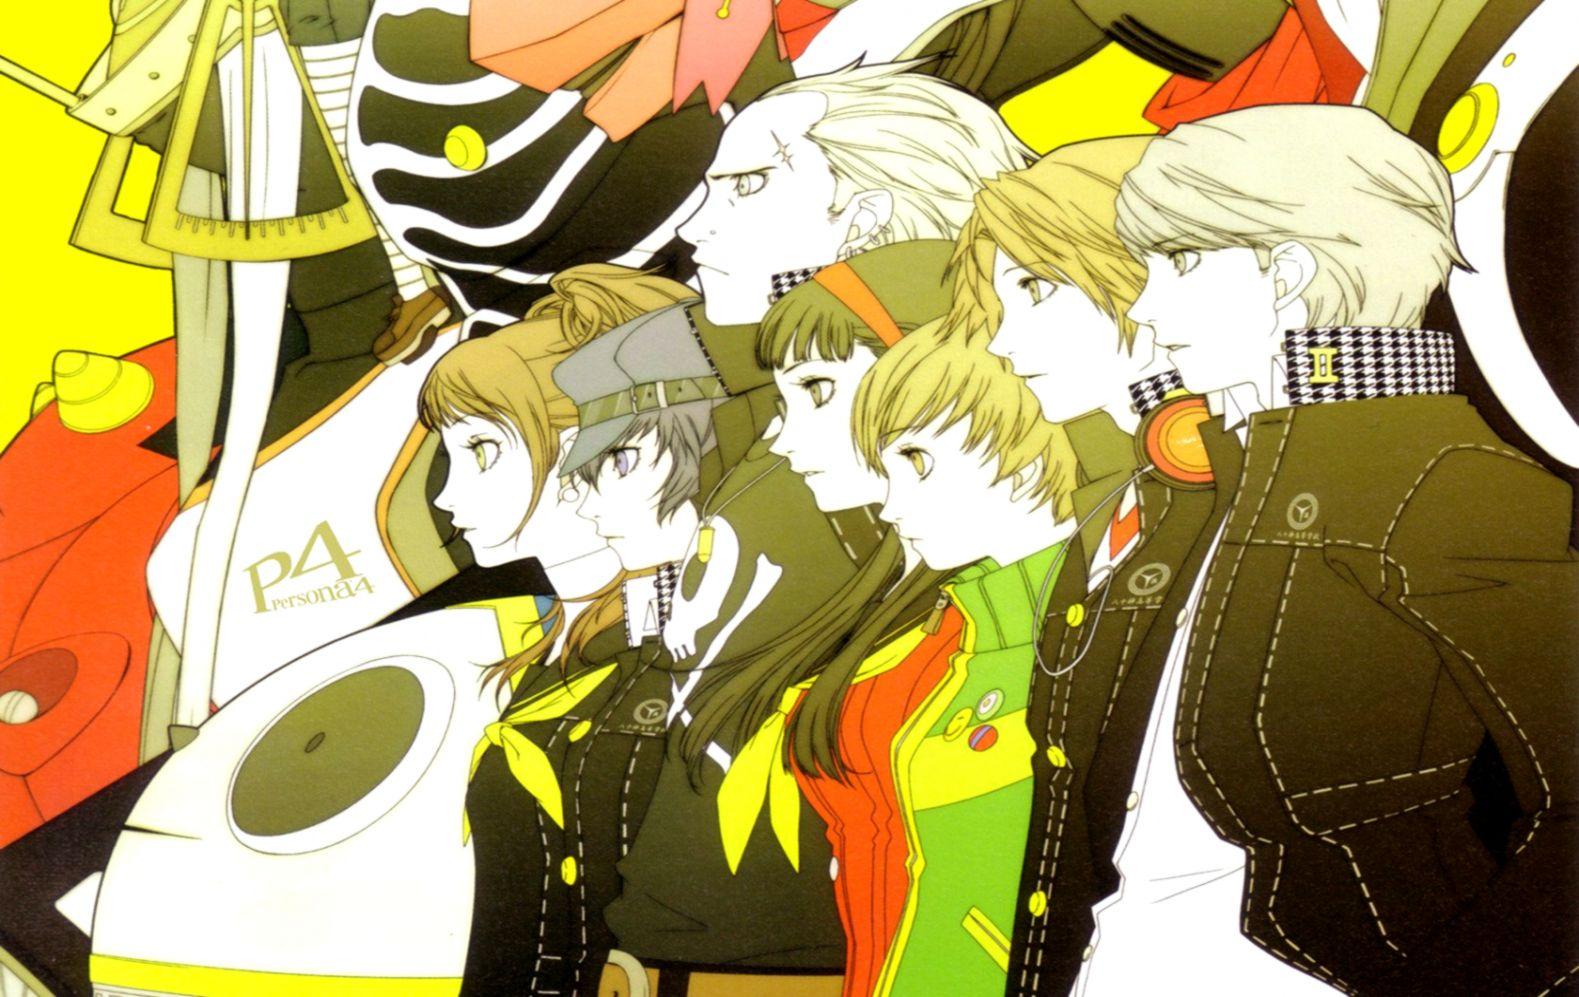 Persona 4 Wallpaper Hd Wallpapers Genius